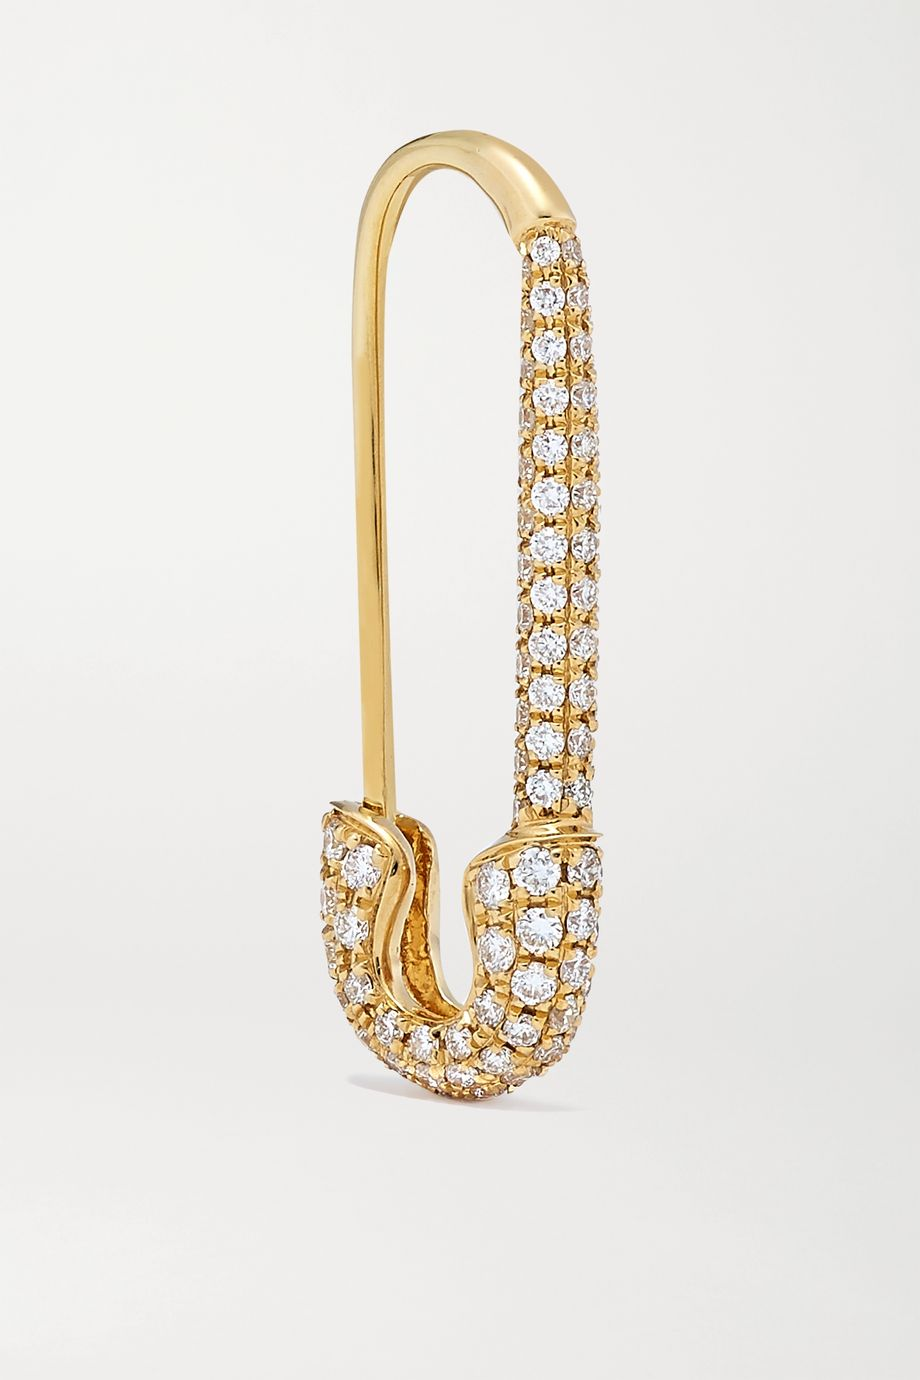 Anita Ko Safety Pin 18K 黄金钻石单只耳环